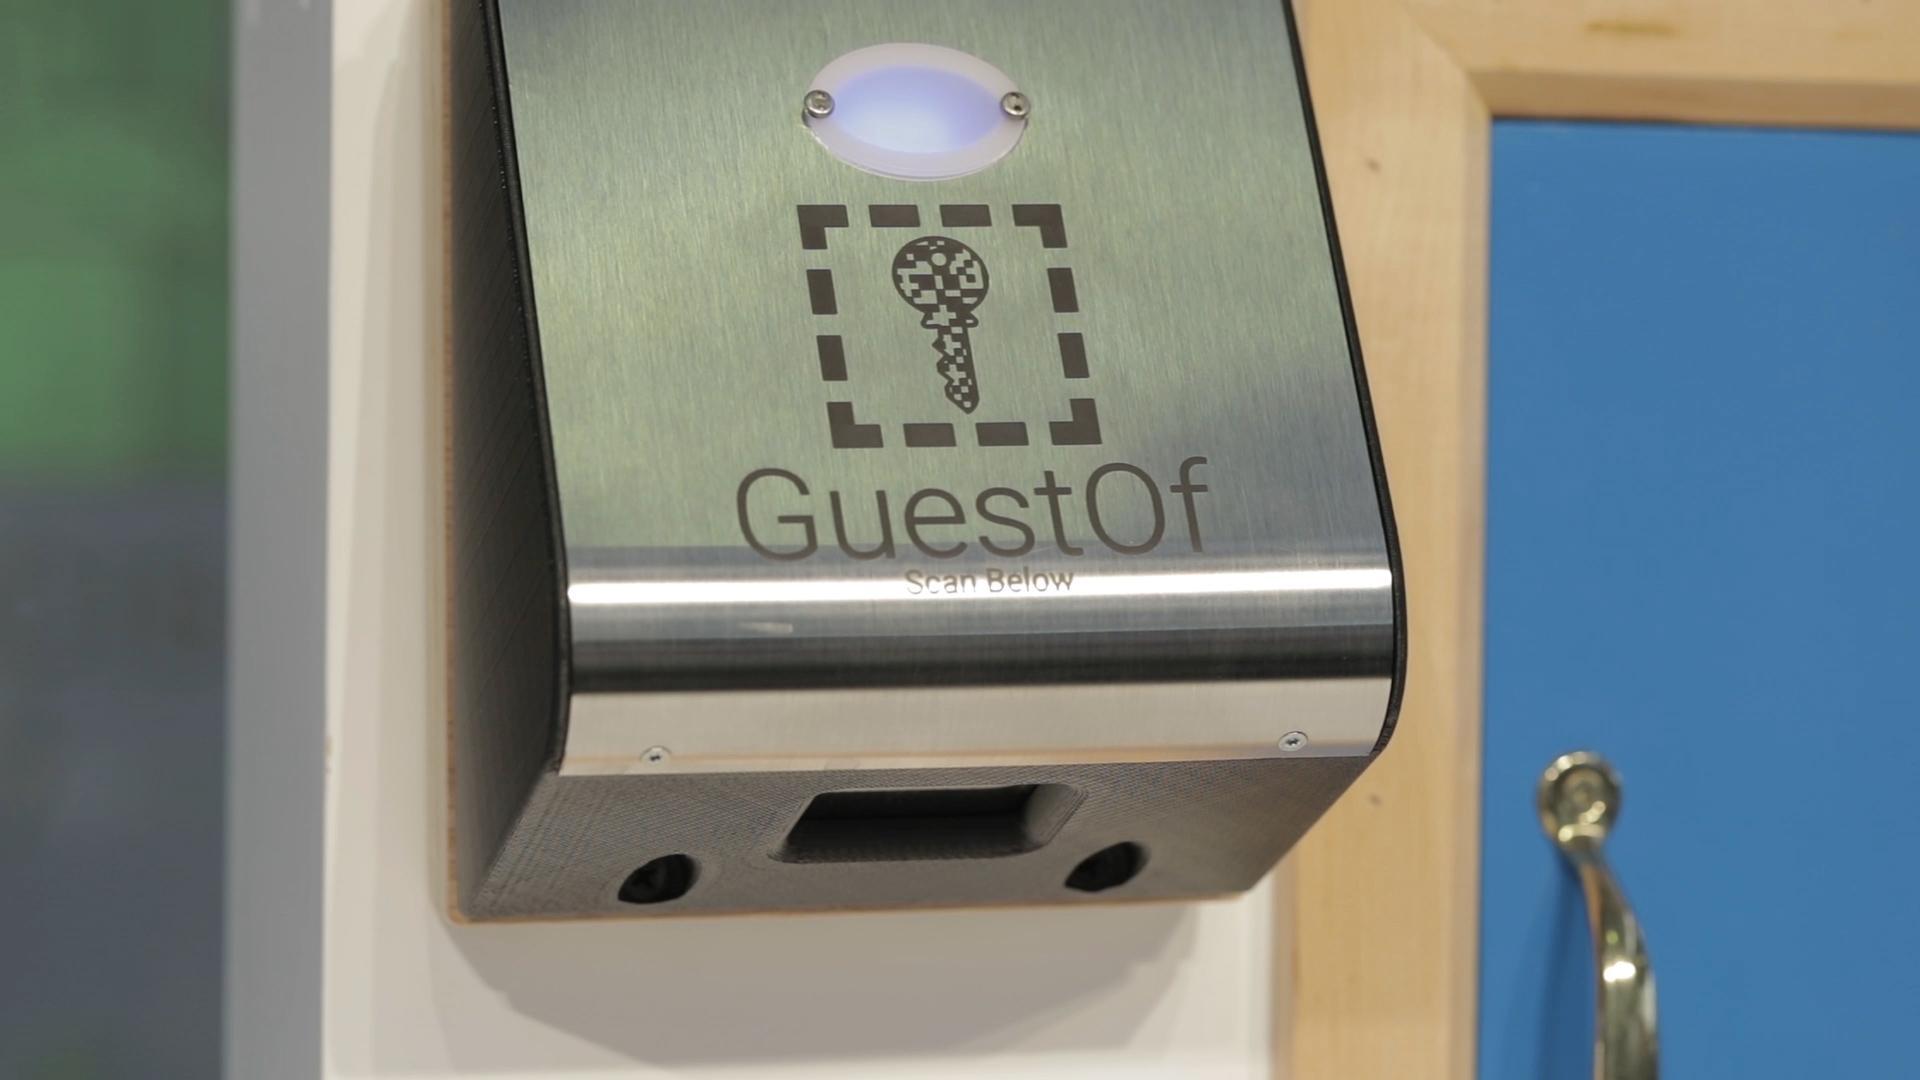 Guest Of QR Lock